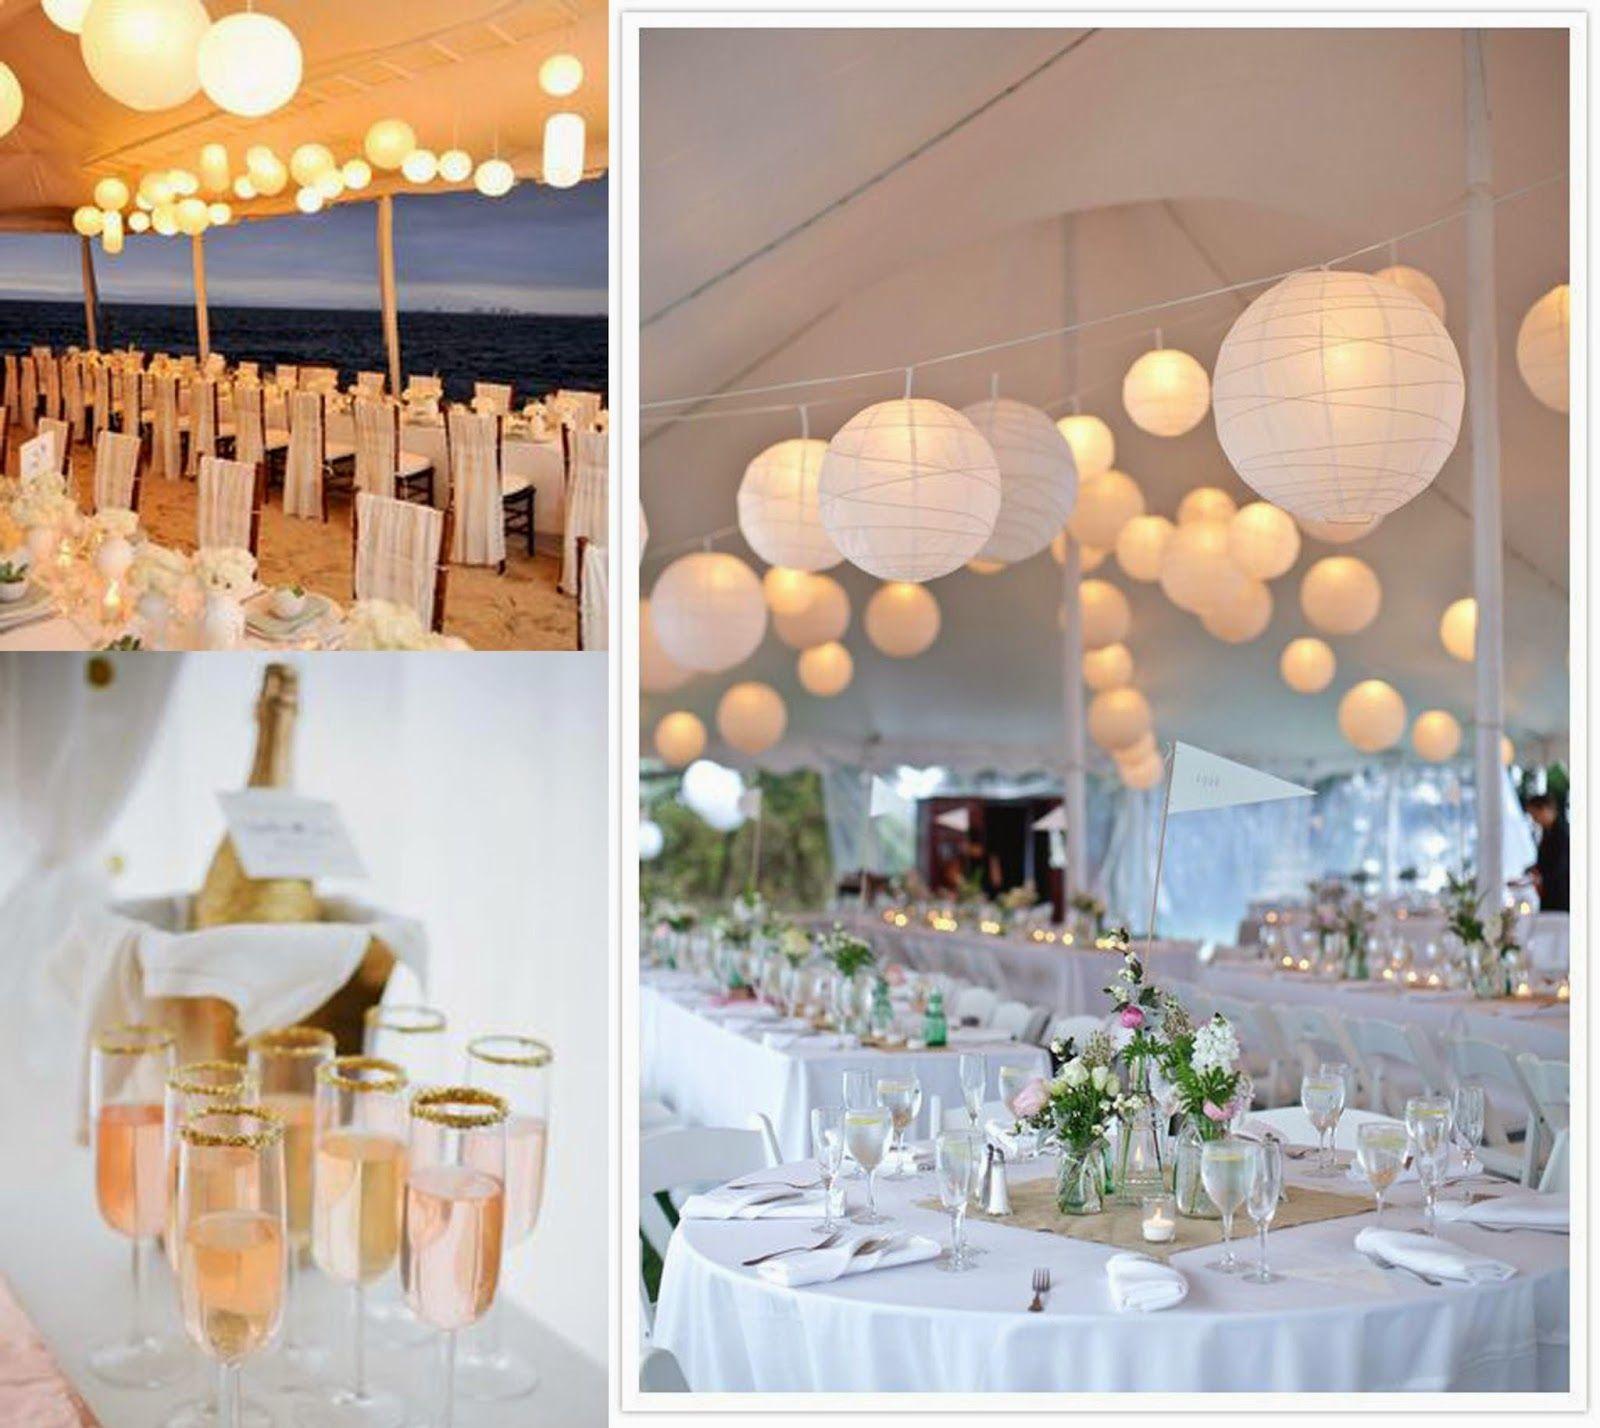 Wedding decorations paper  wedding venue inspiration  WEDDING  Pinterest  Wedding venues